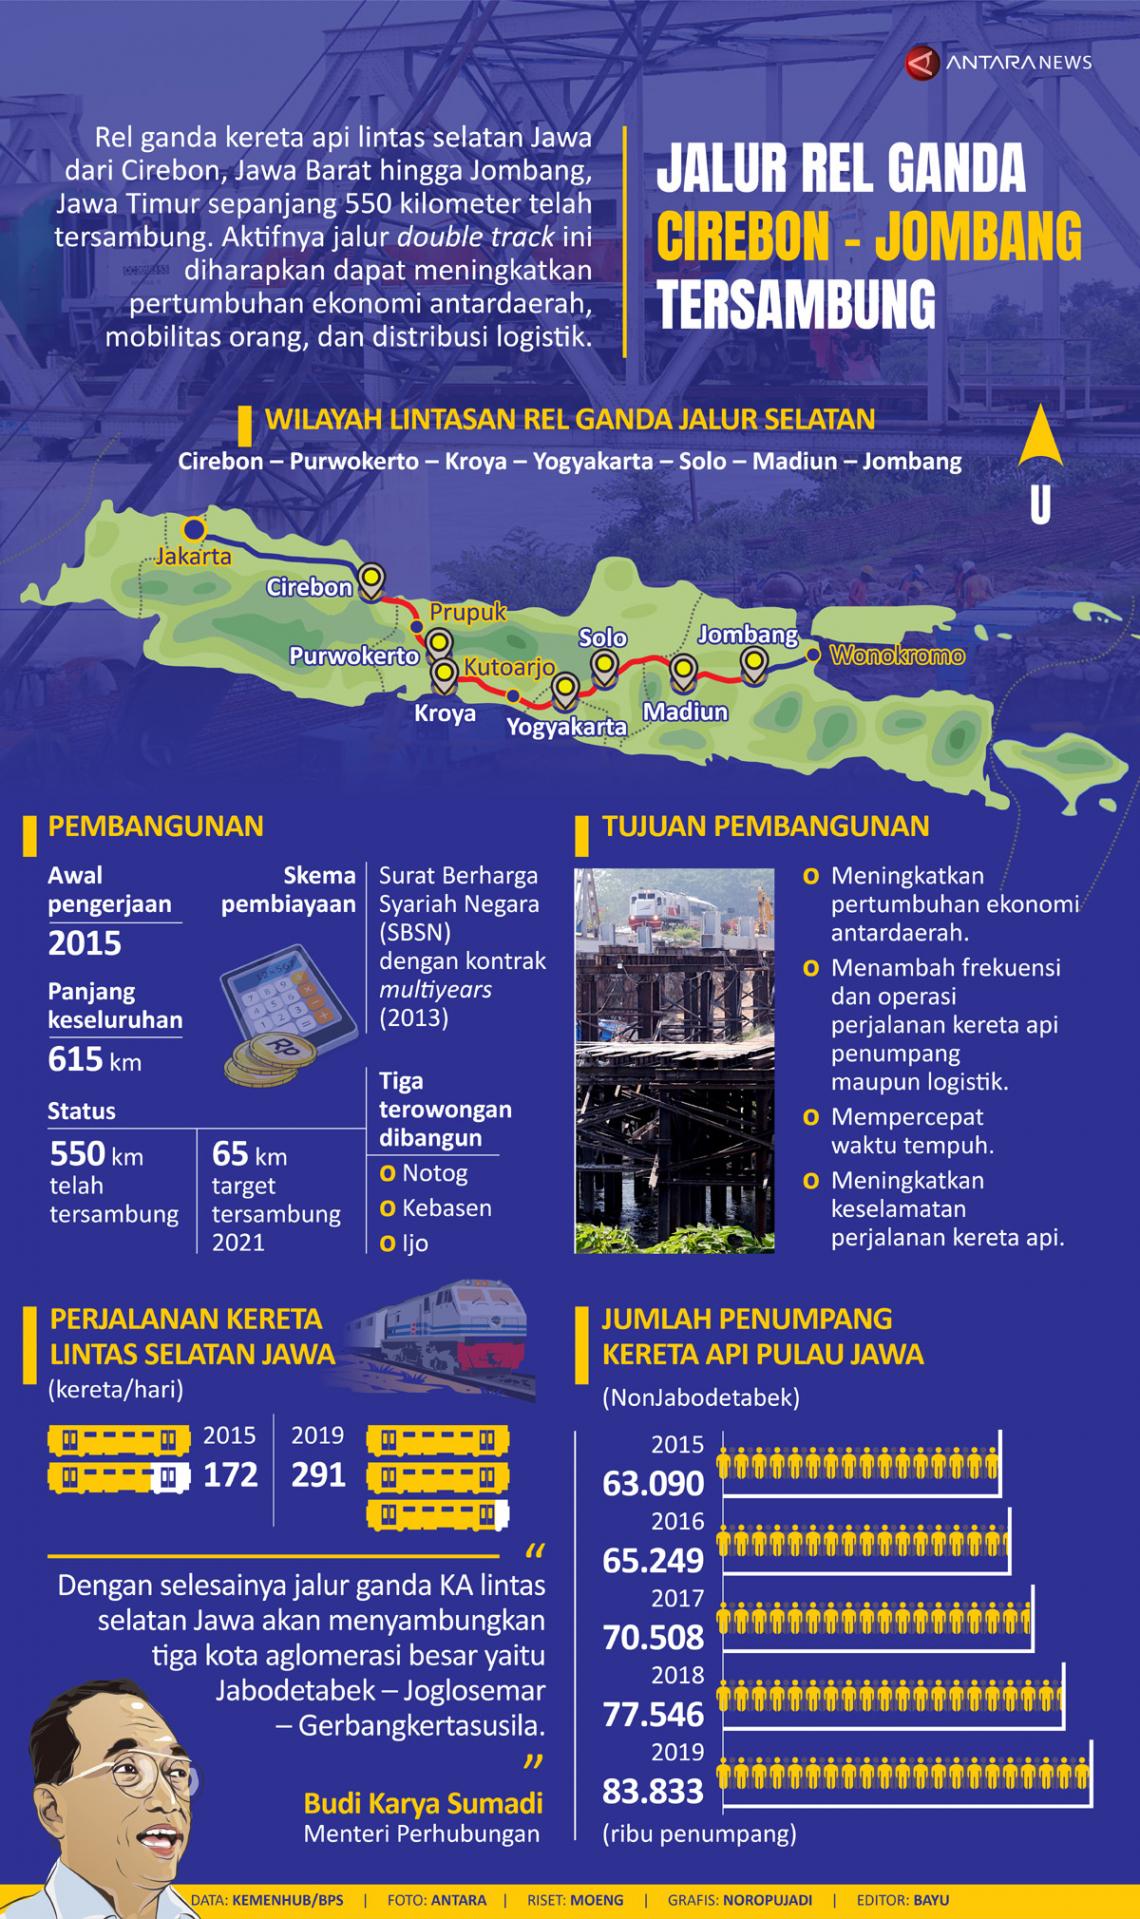 Jalur rel ganda Cirebon - Jombang tersambung